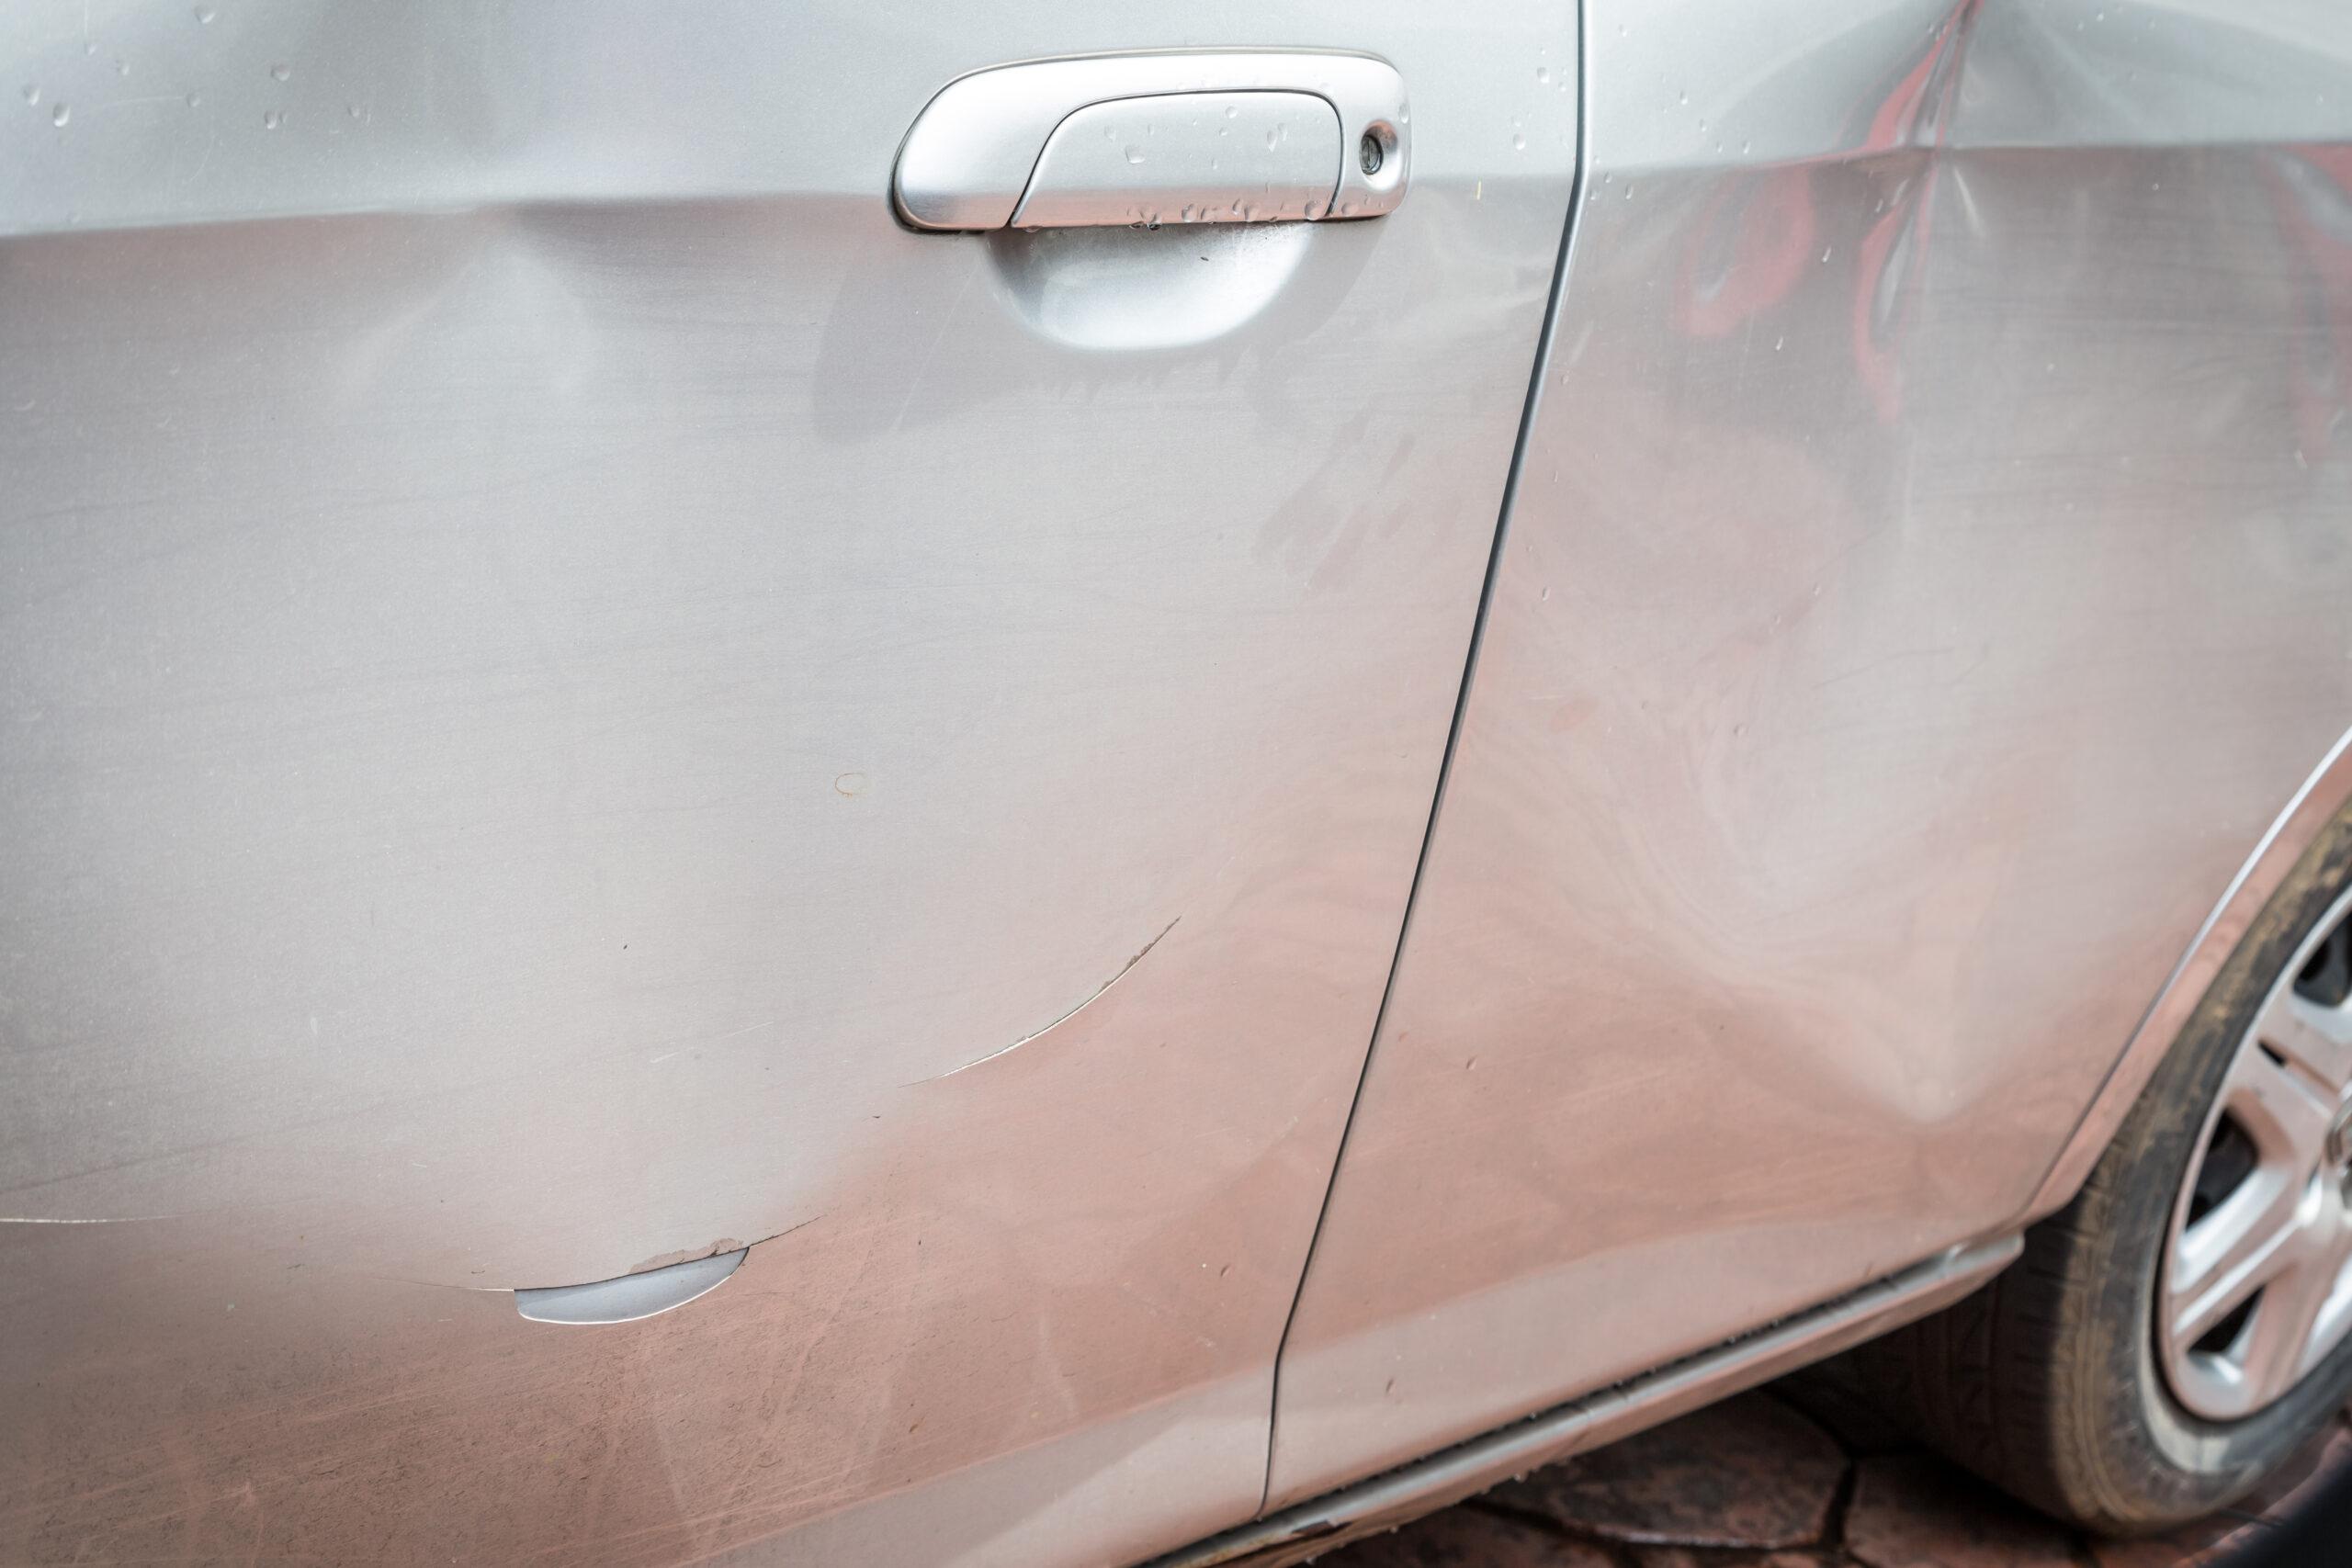 Smart Car Door Damage